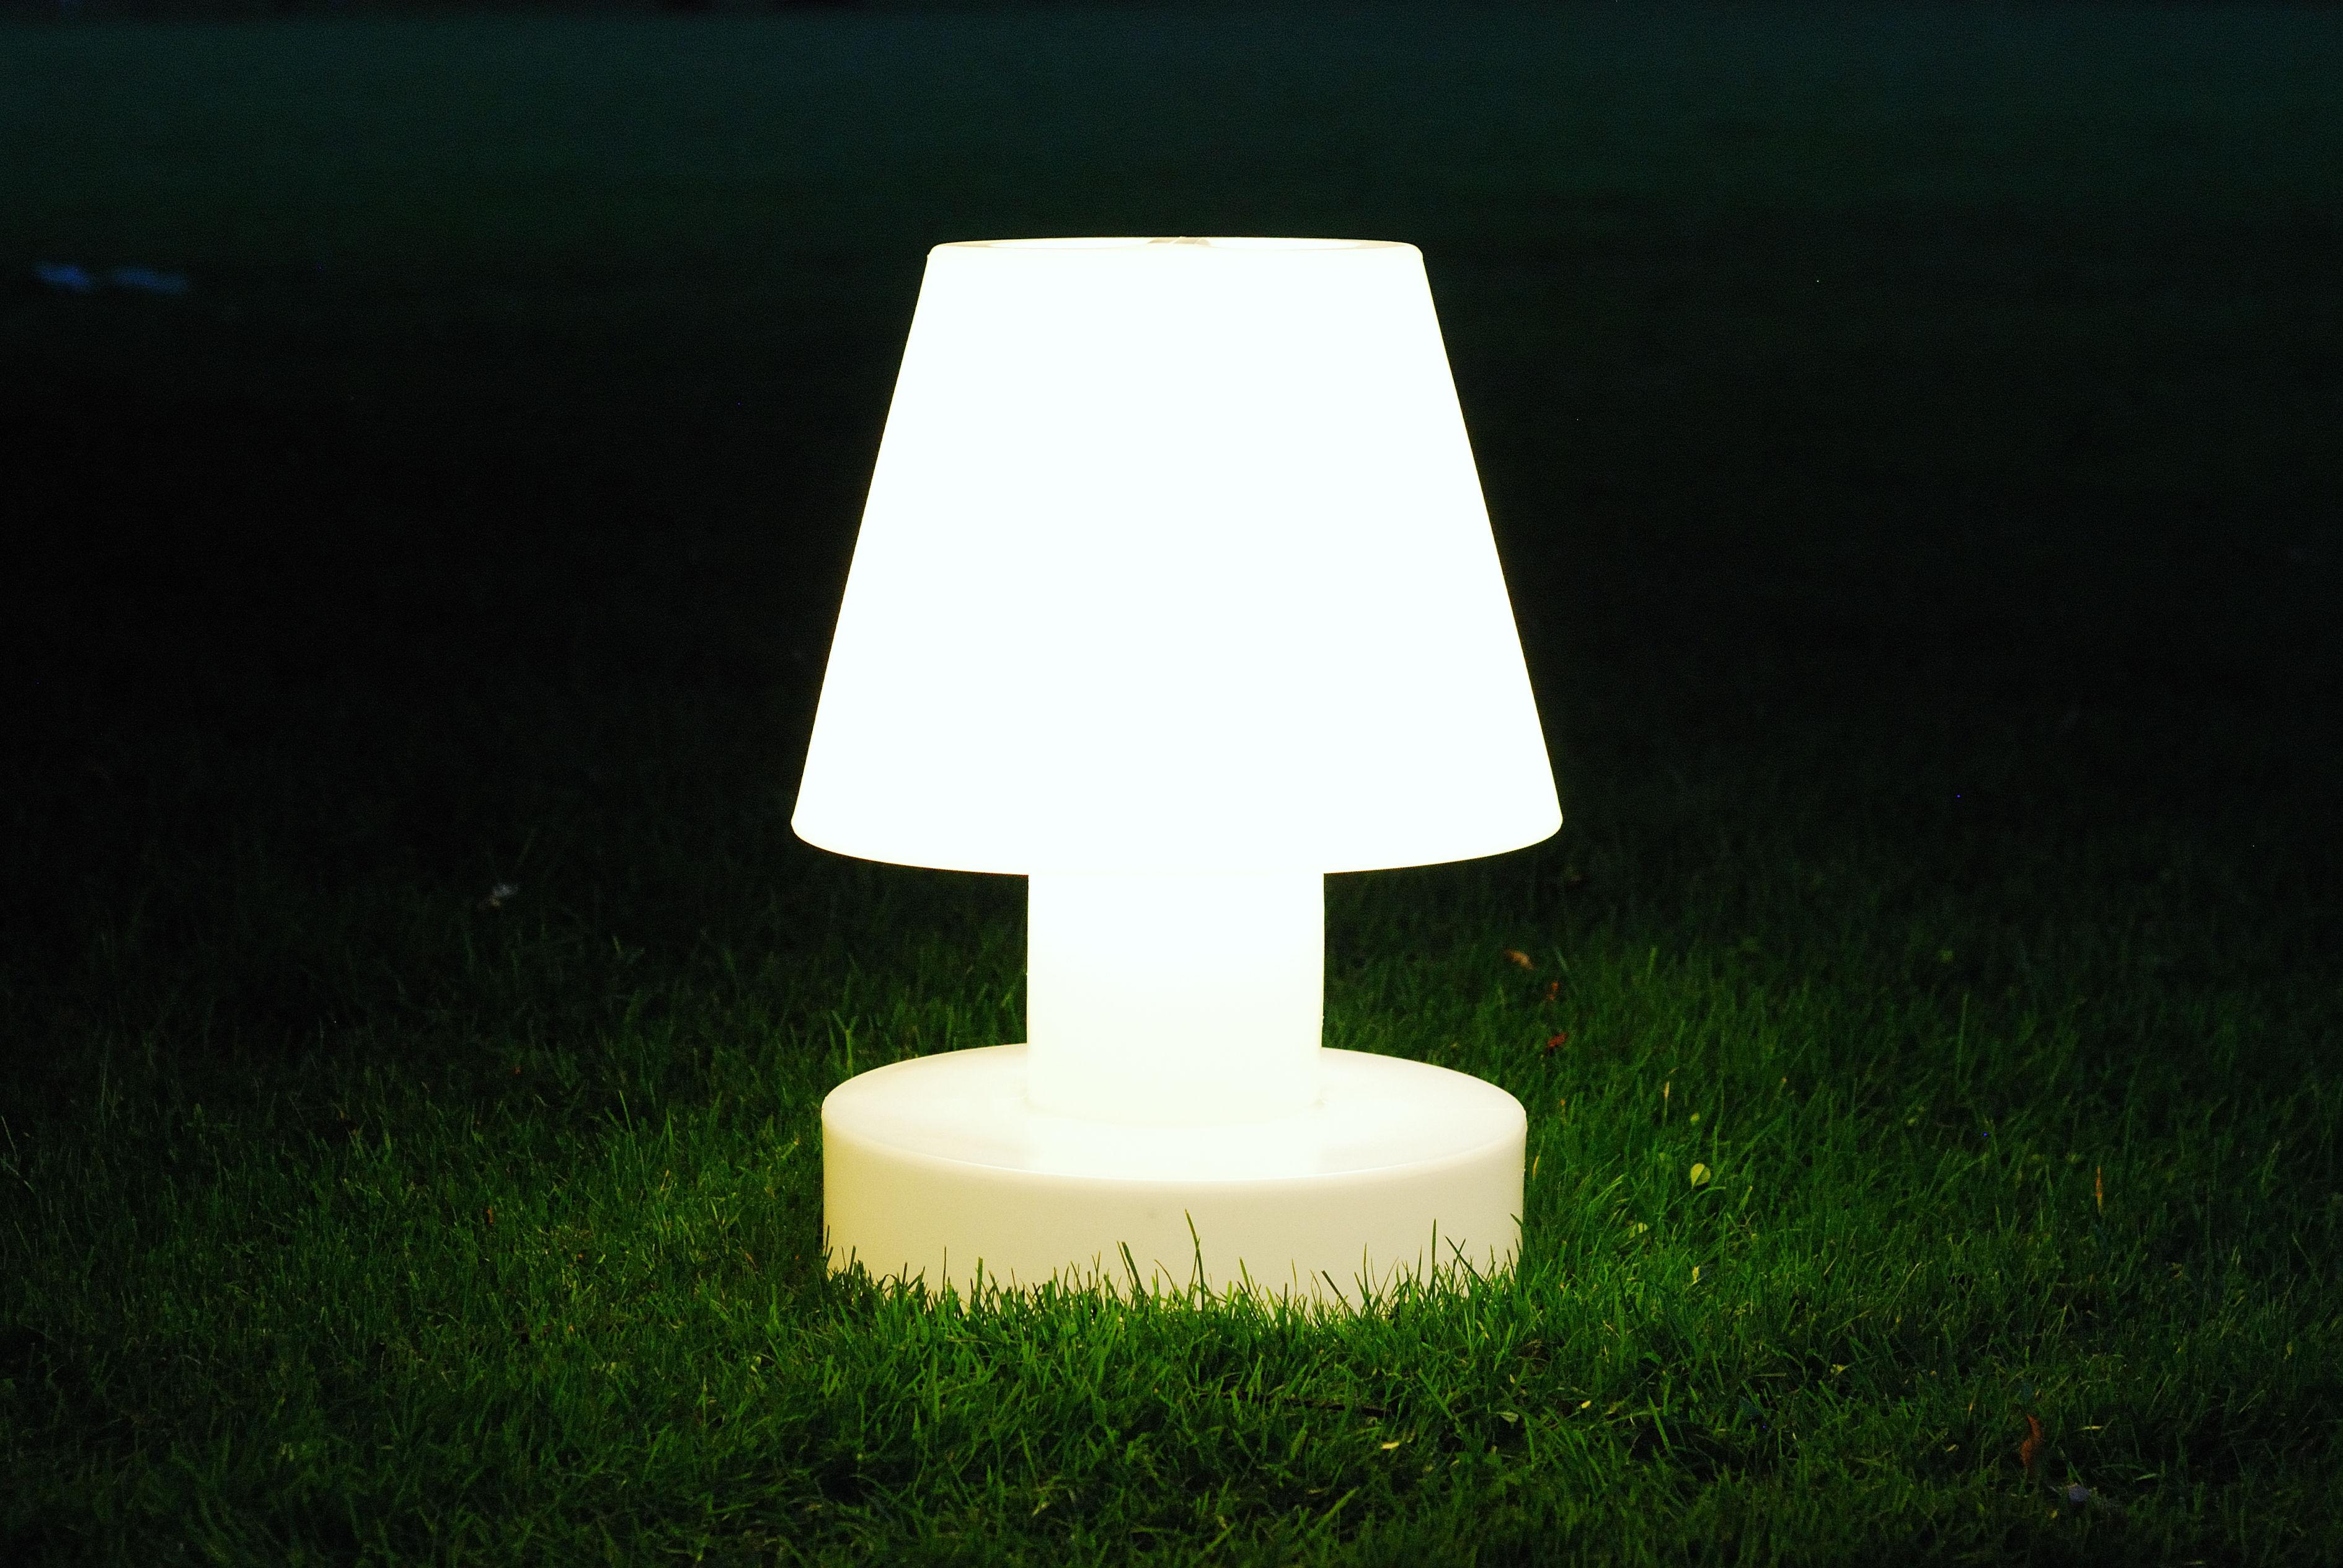 Lampada senza fili portatile senza filo ricaricabile h 40 cm